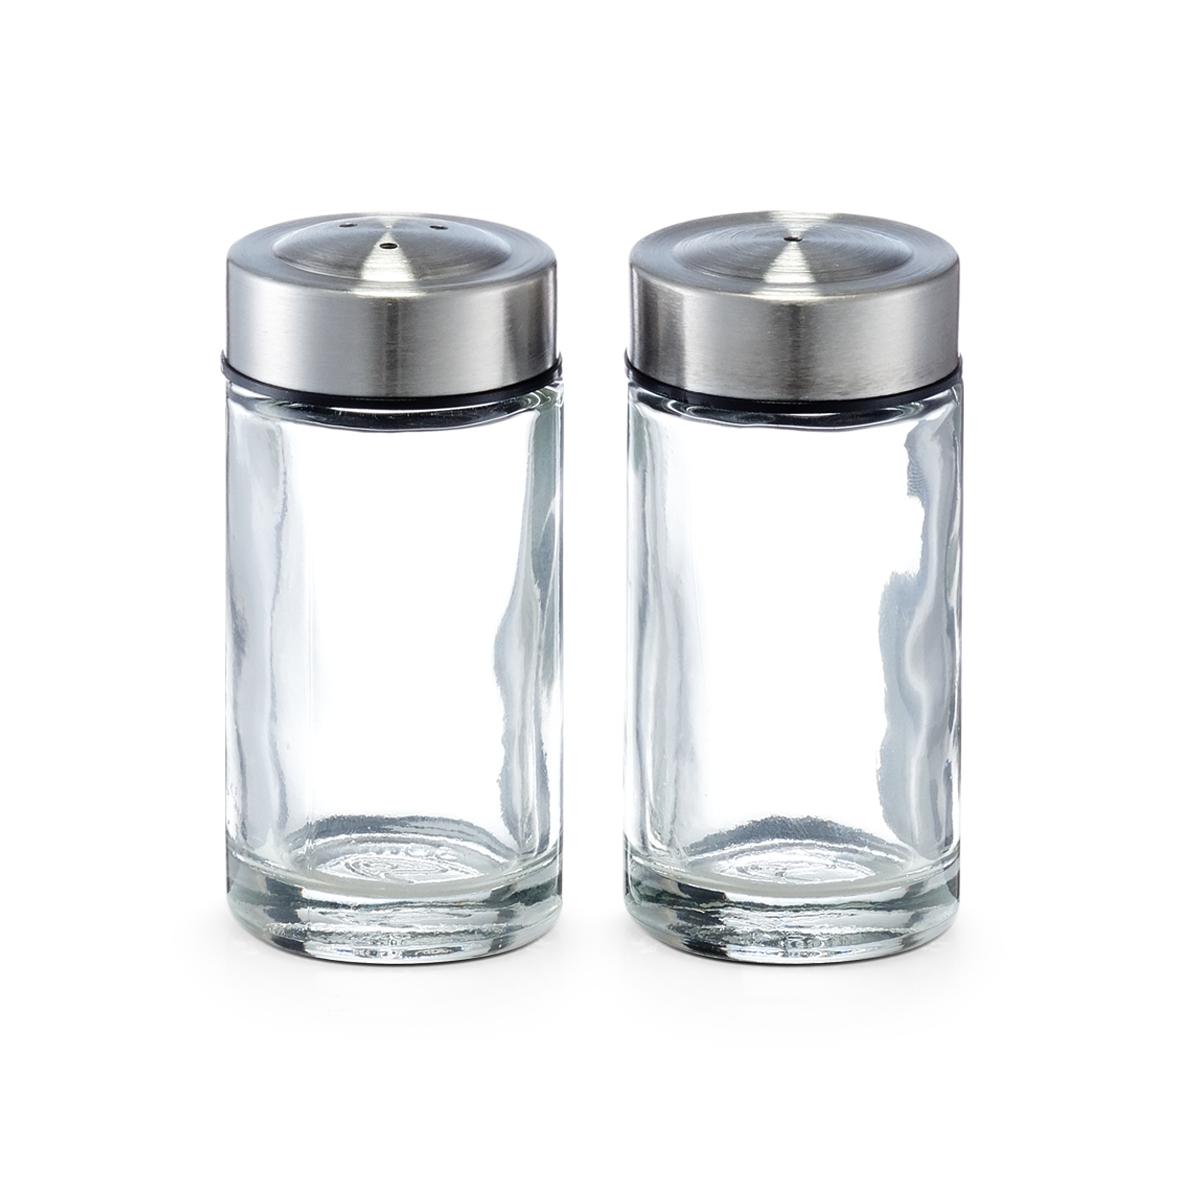 Set solnita si pipernita din sticla, 35 ml, Ø 3,8xH8 cm imagine